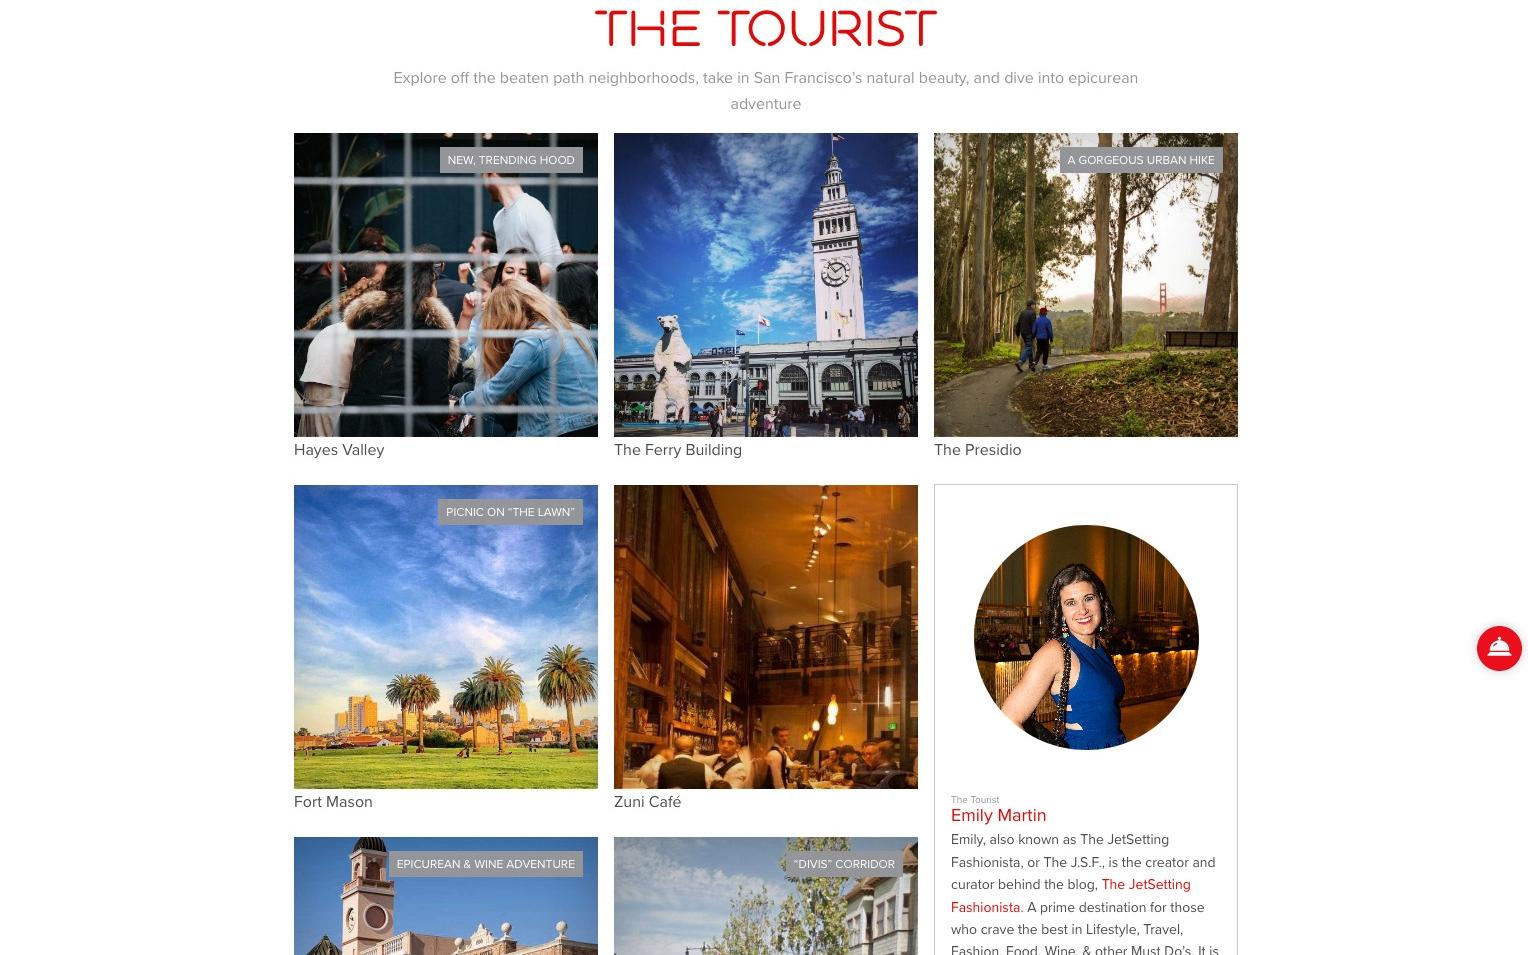 Virgin Hotels - The Tourist by Emily Martin aka The JetSetting Fashionista